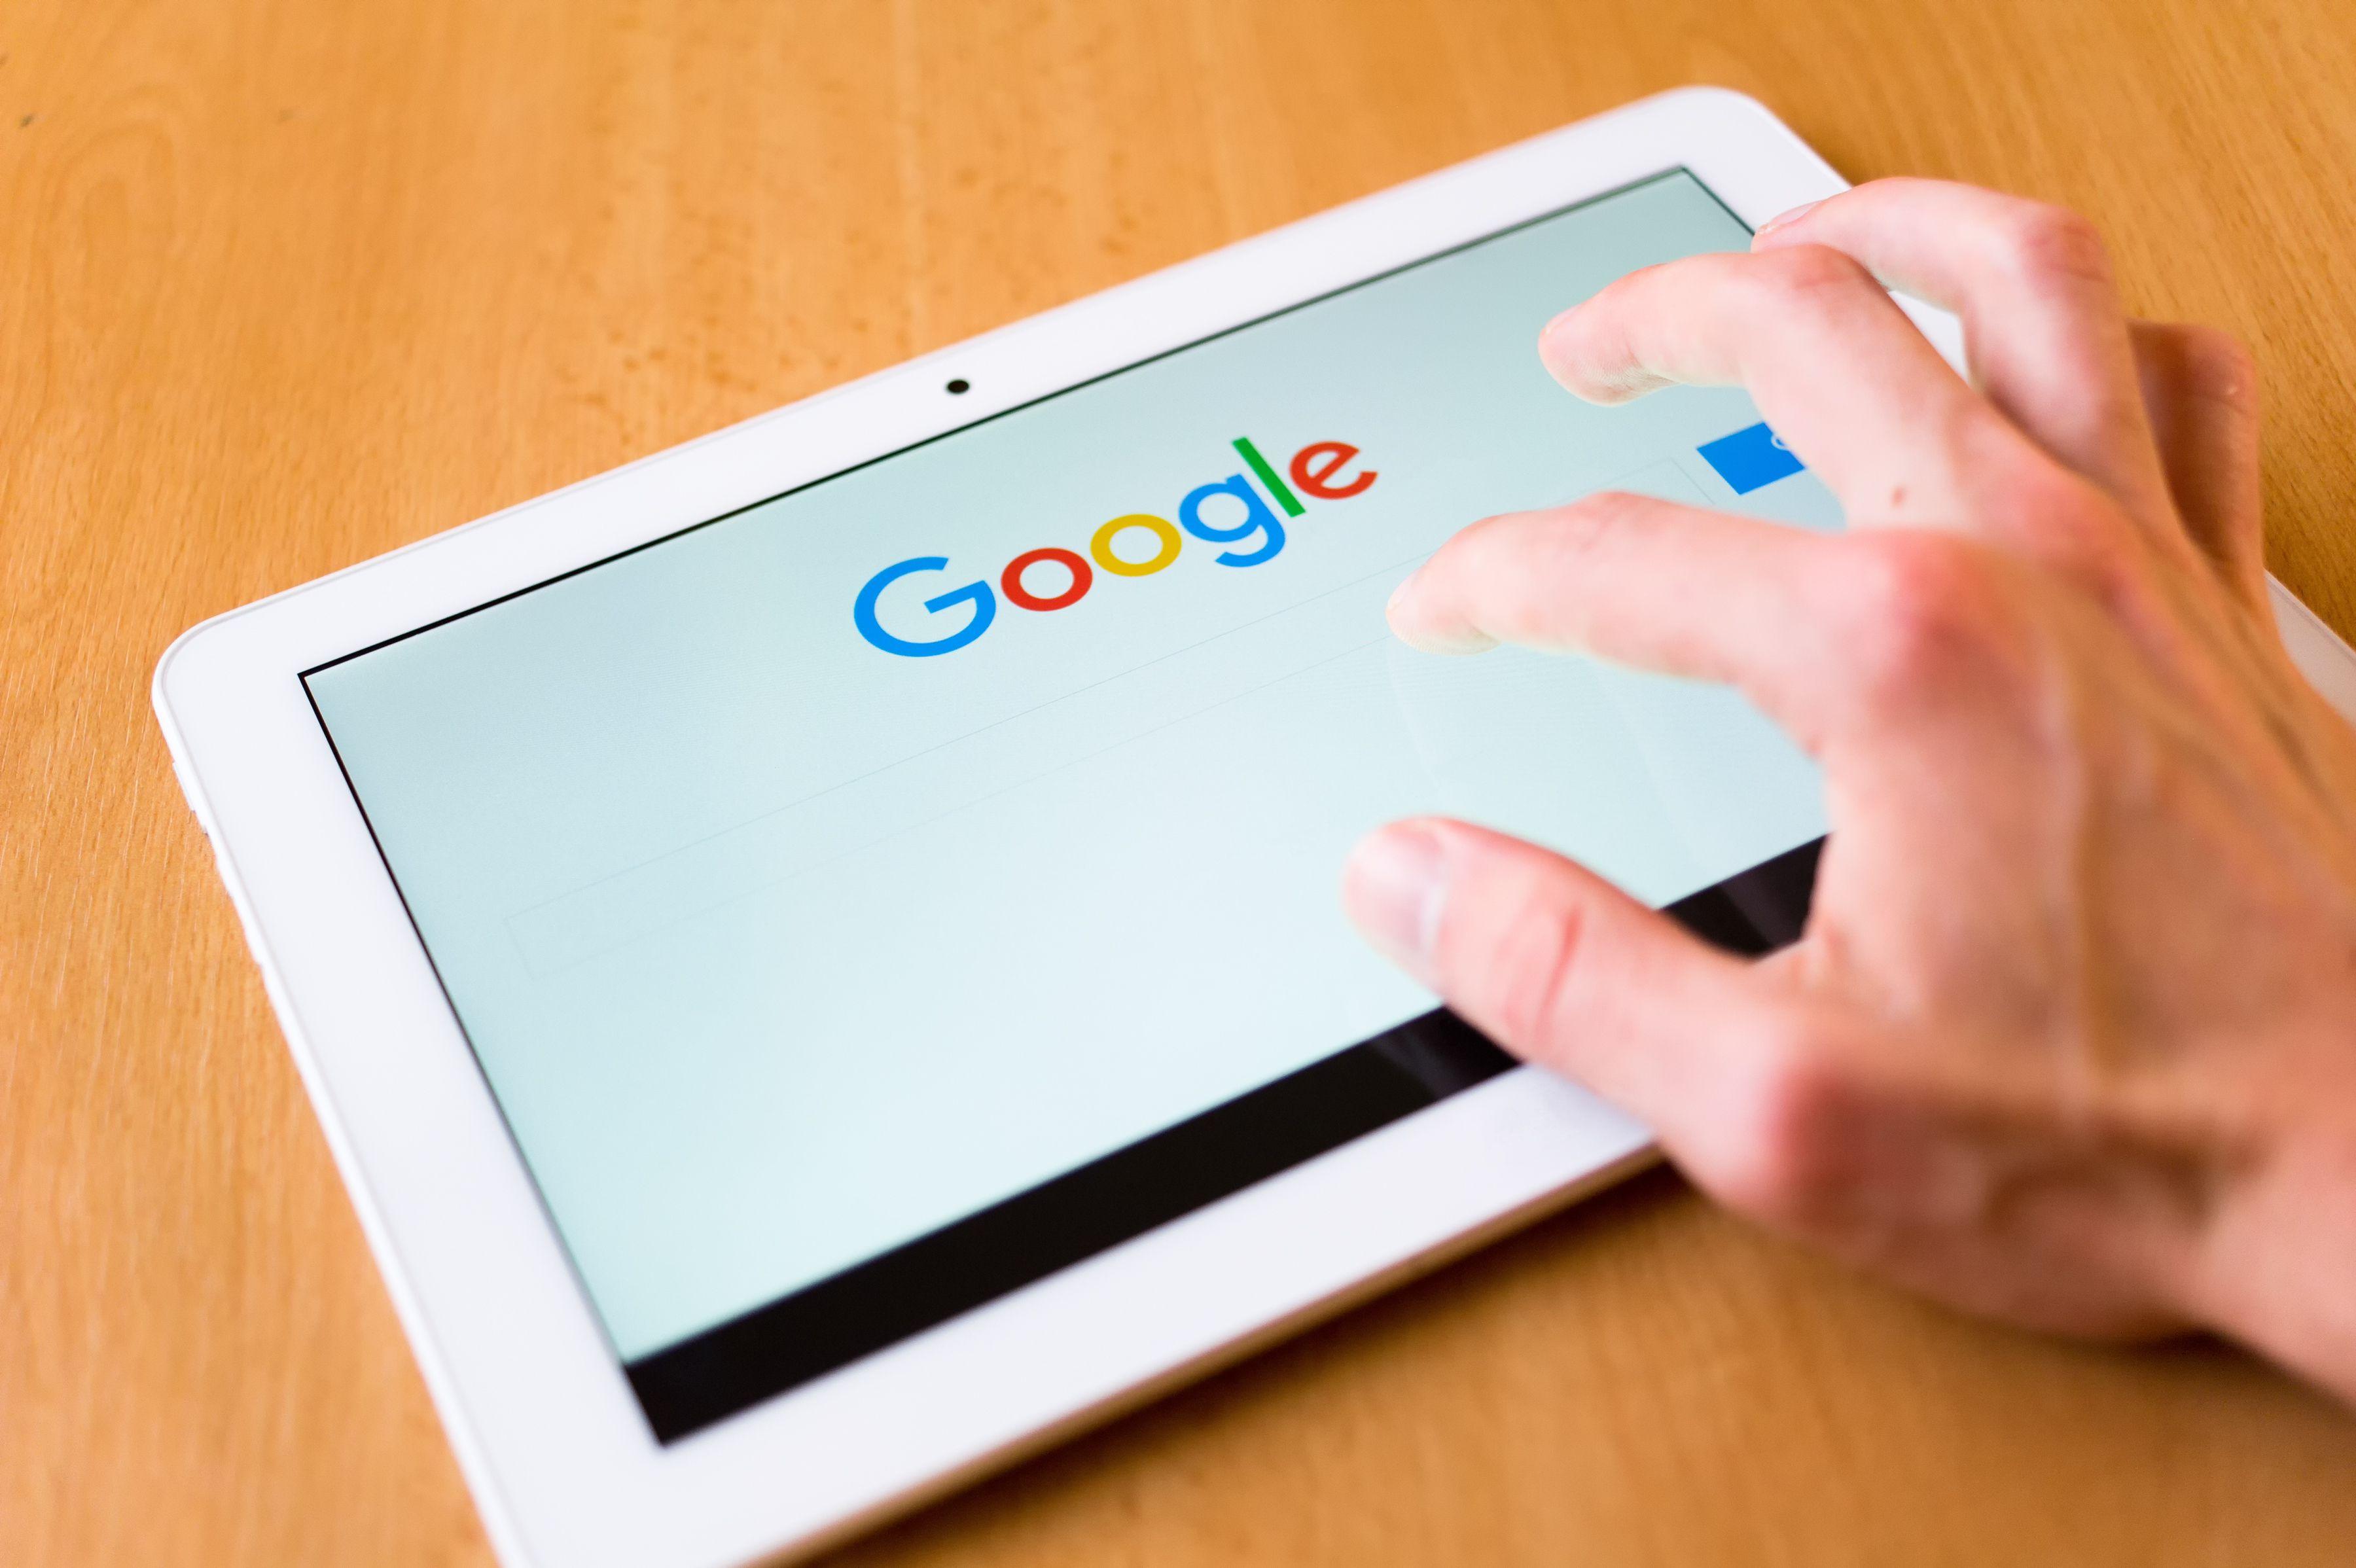 Simple Google Search Tricks The Top Ten